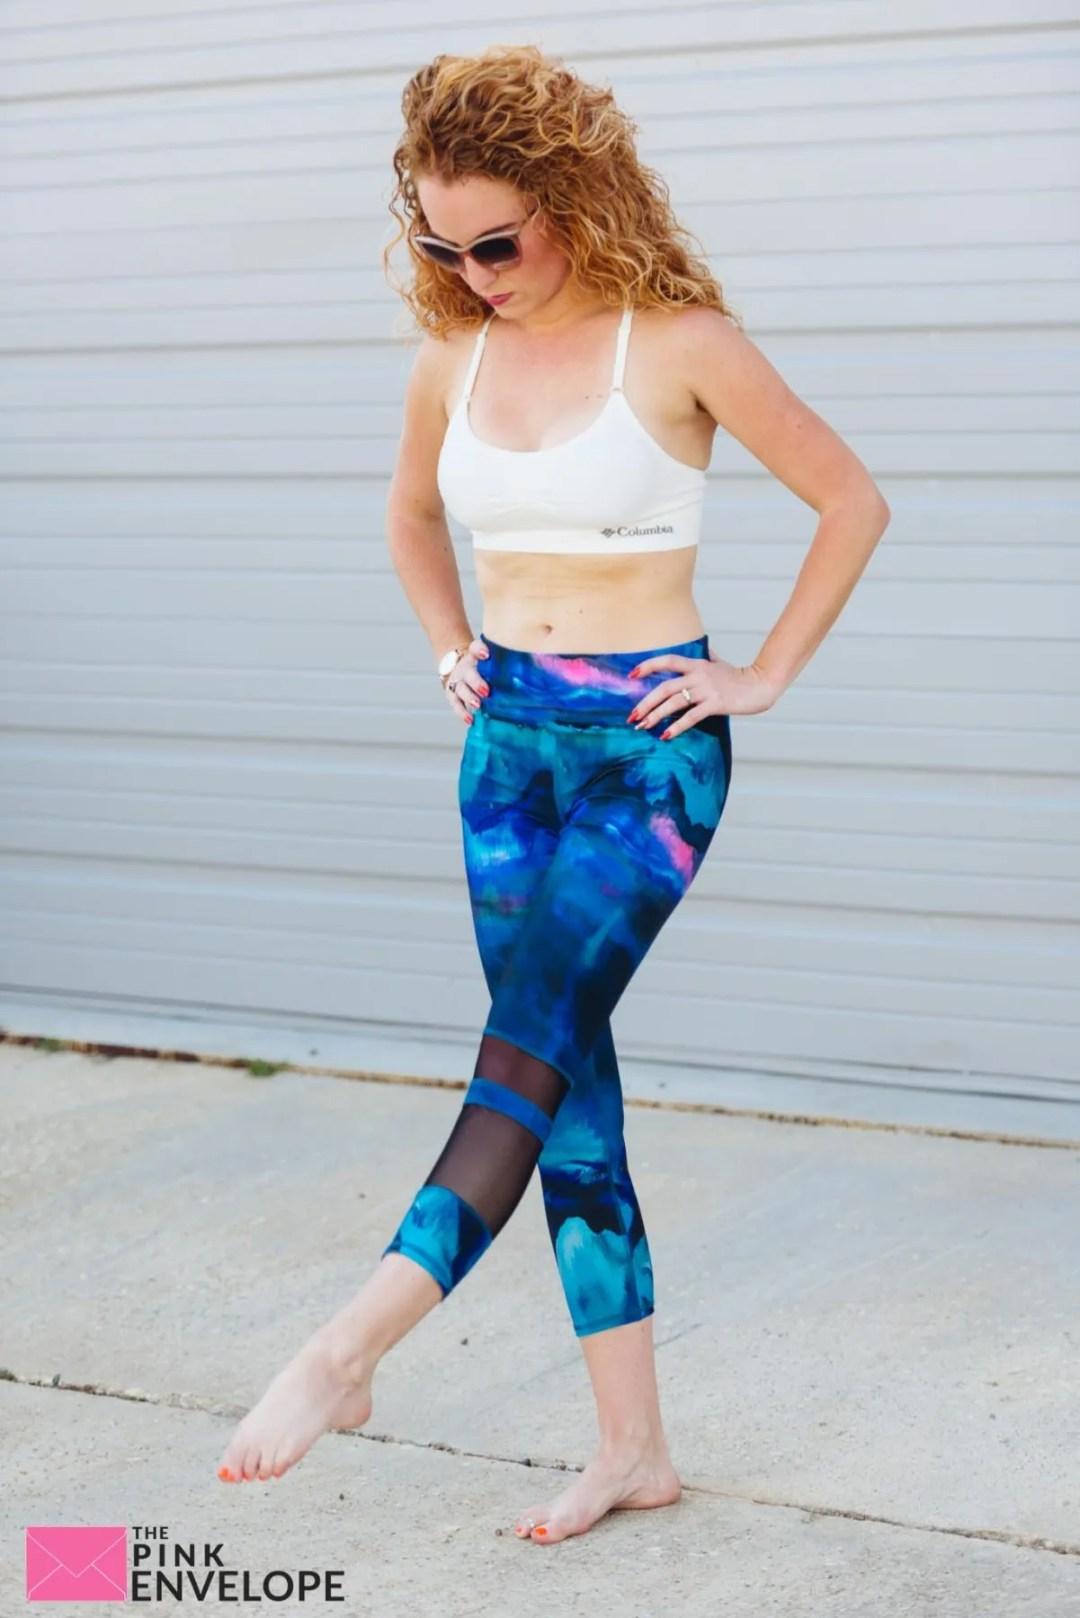 Yoga Clothes Sent to Your Door - YogaClub